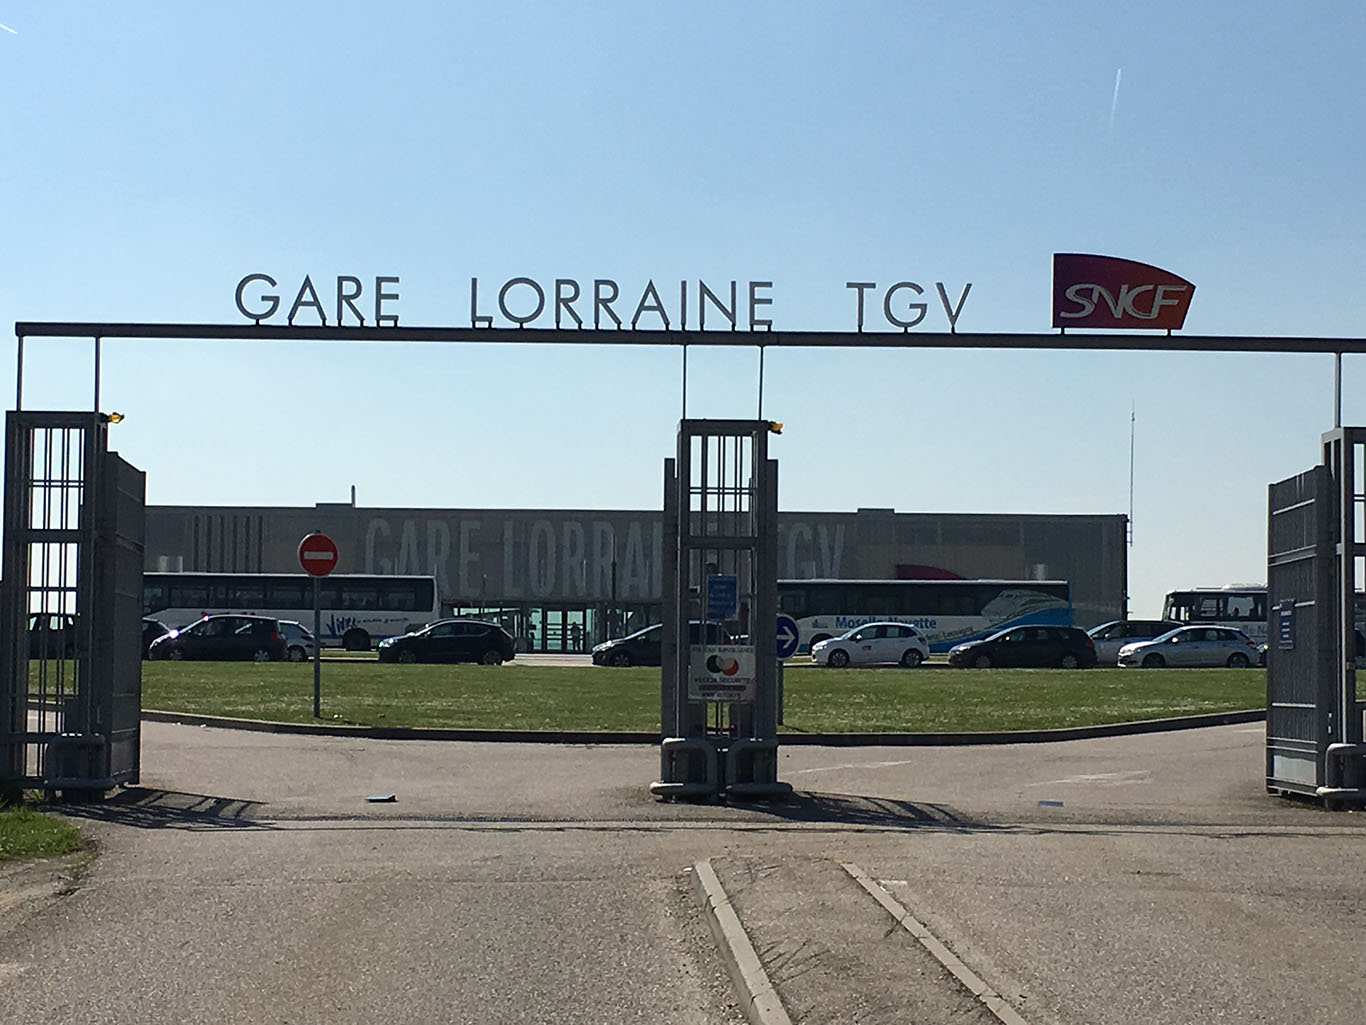 Gare Lorraine TGV